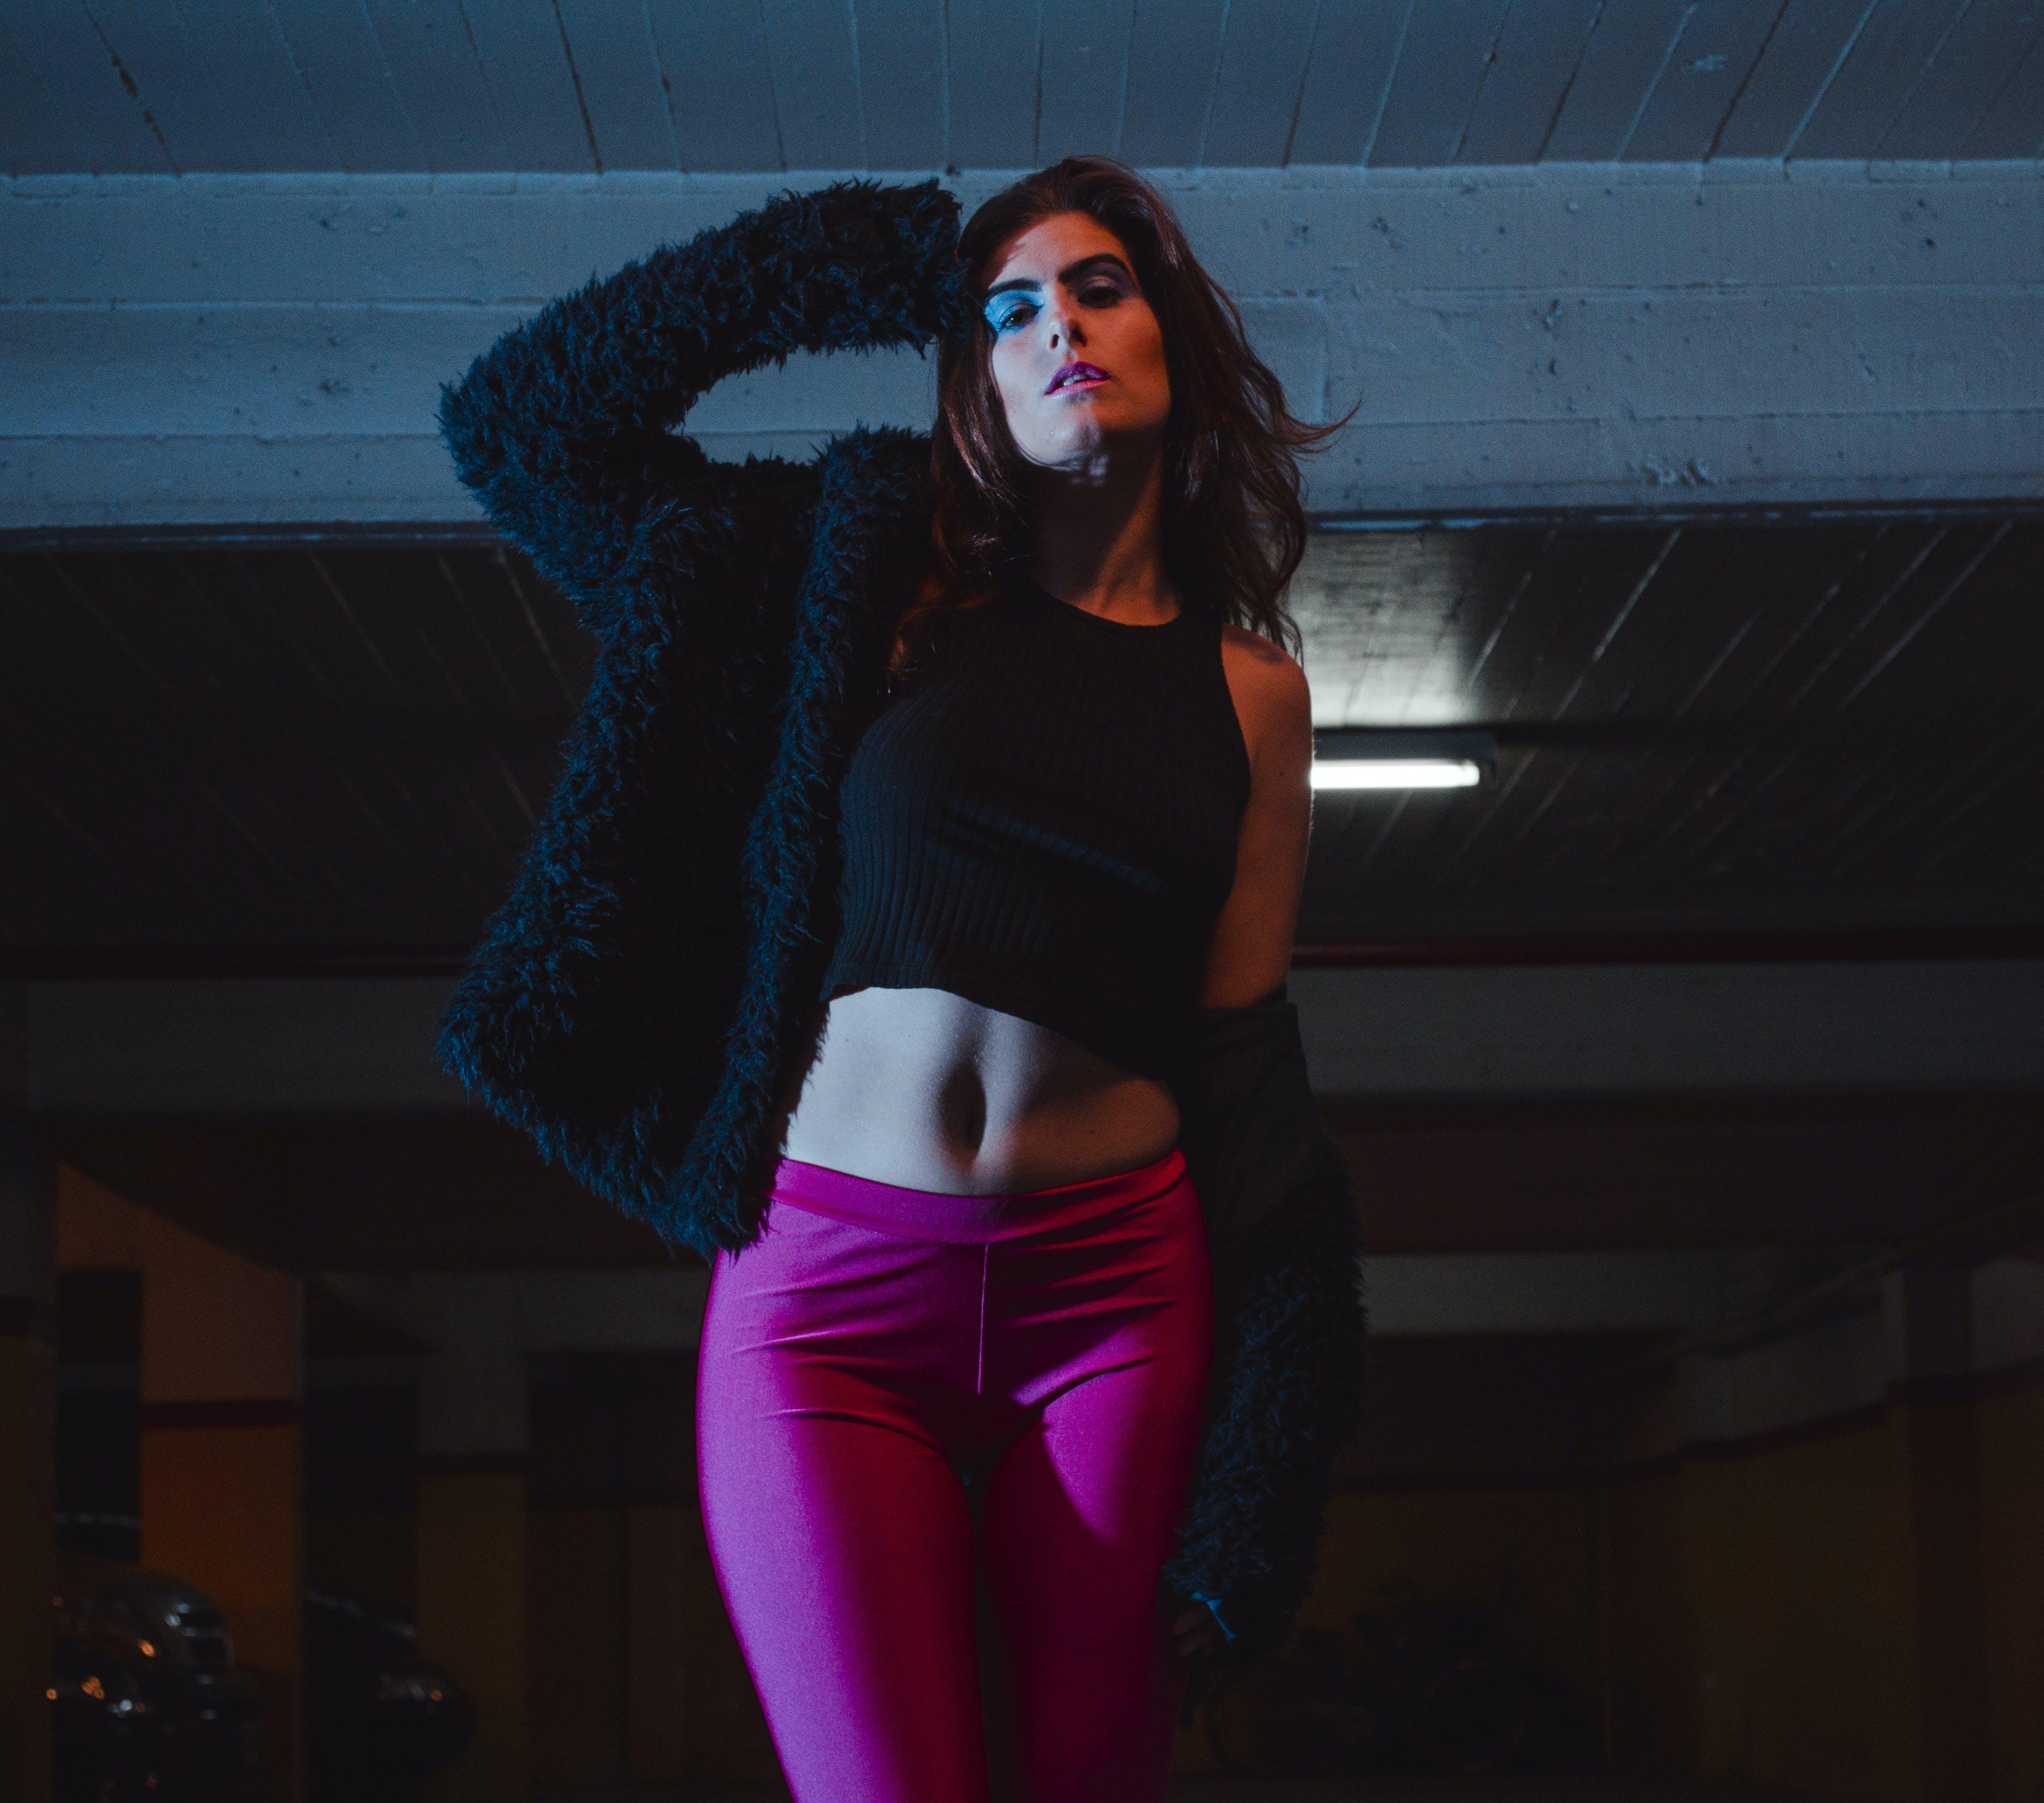 Kostenloses Stock Foto zu erwachsener, fashion, festival, fotoshooting